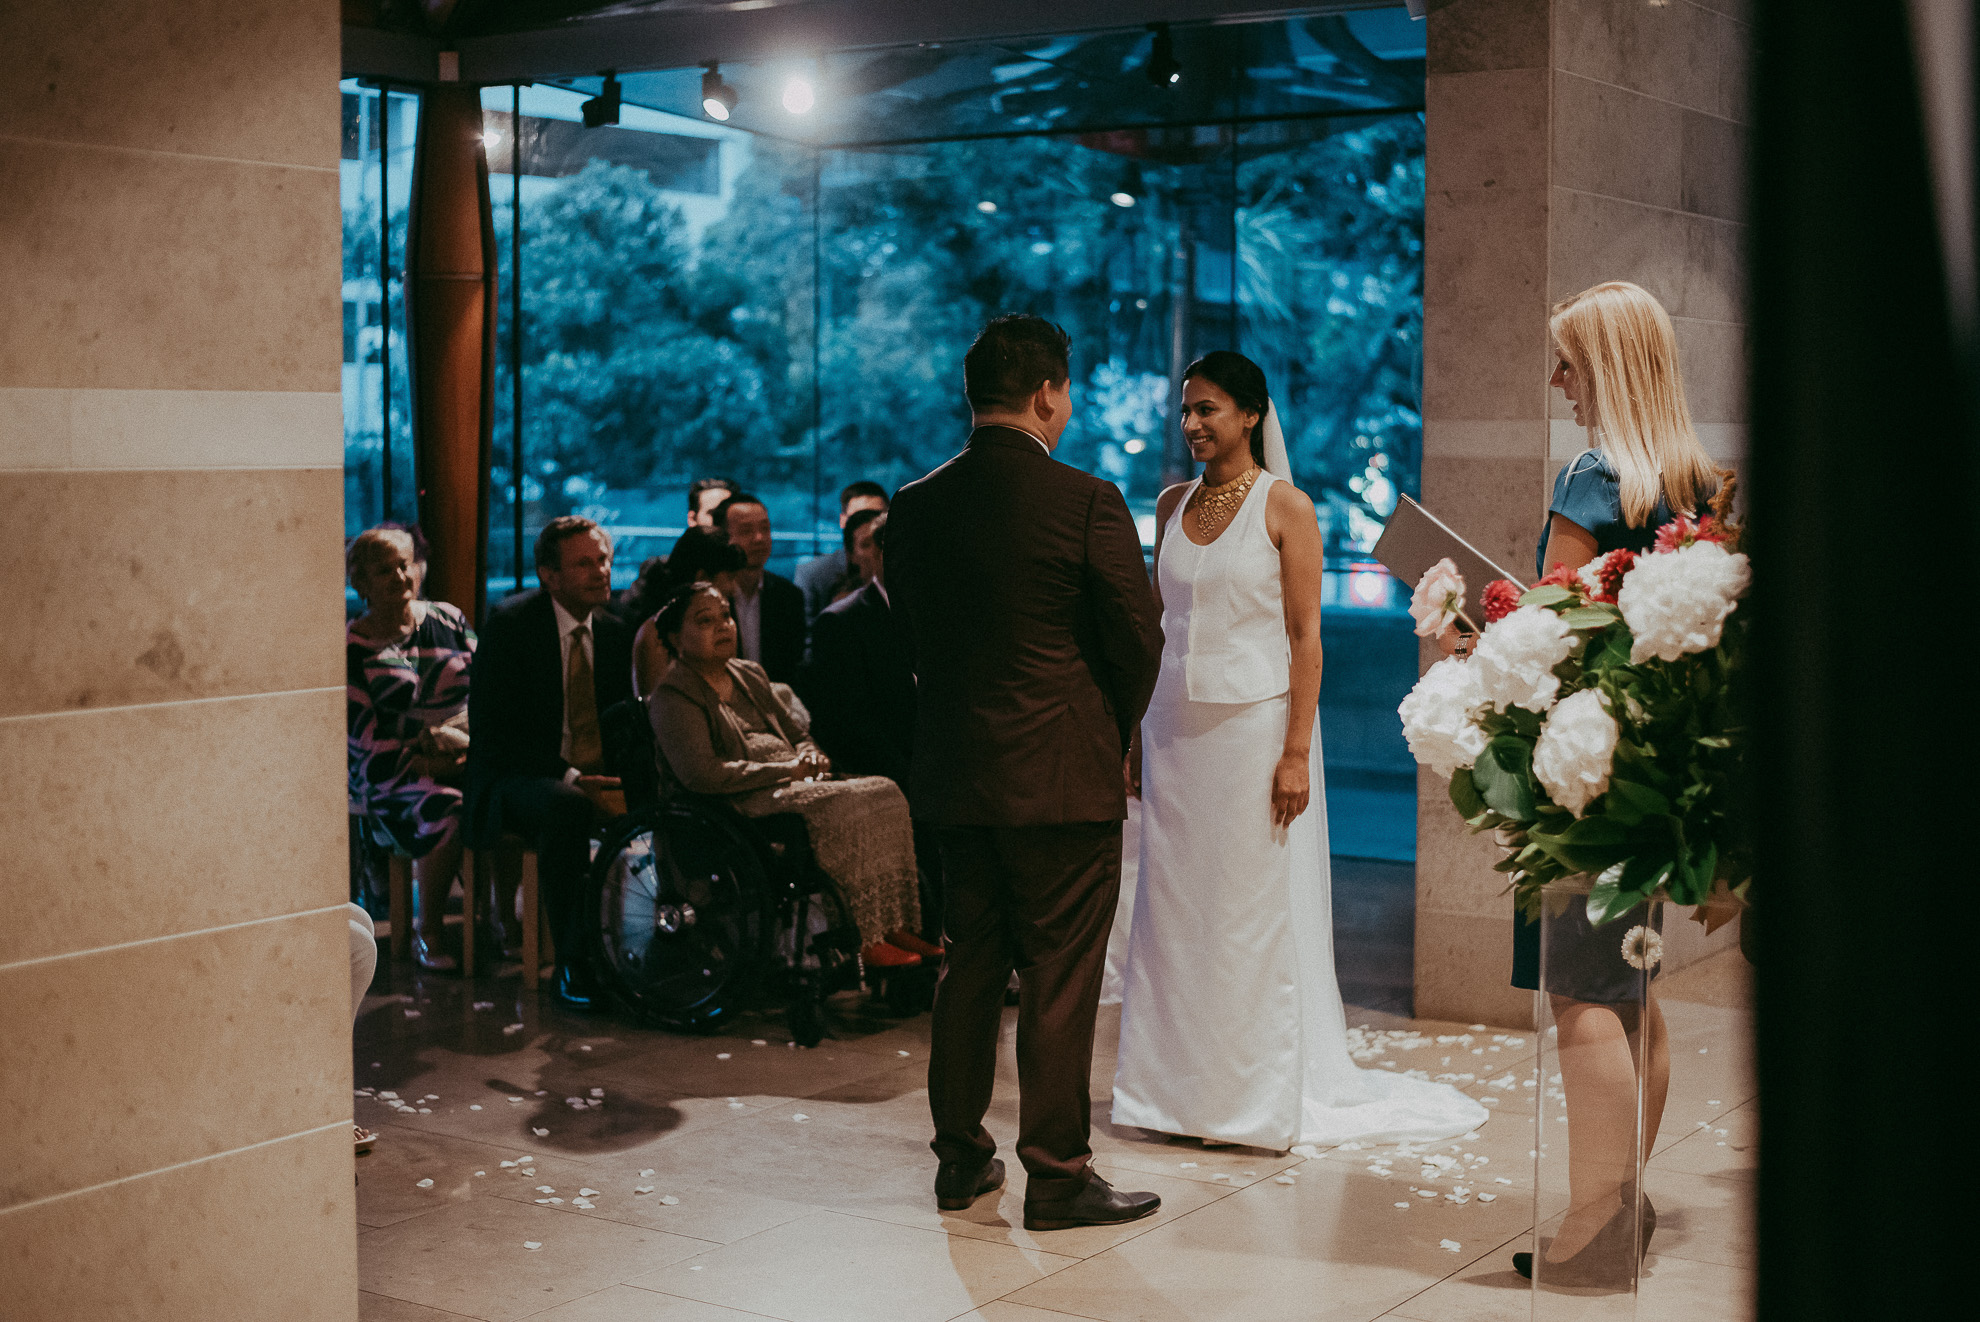 wedding-by-levien-275.JPG